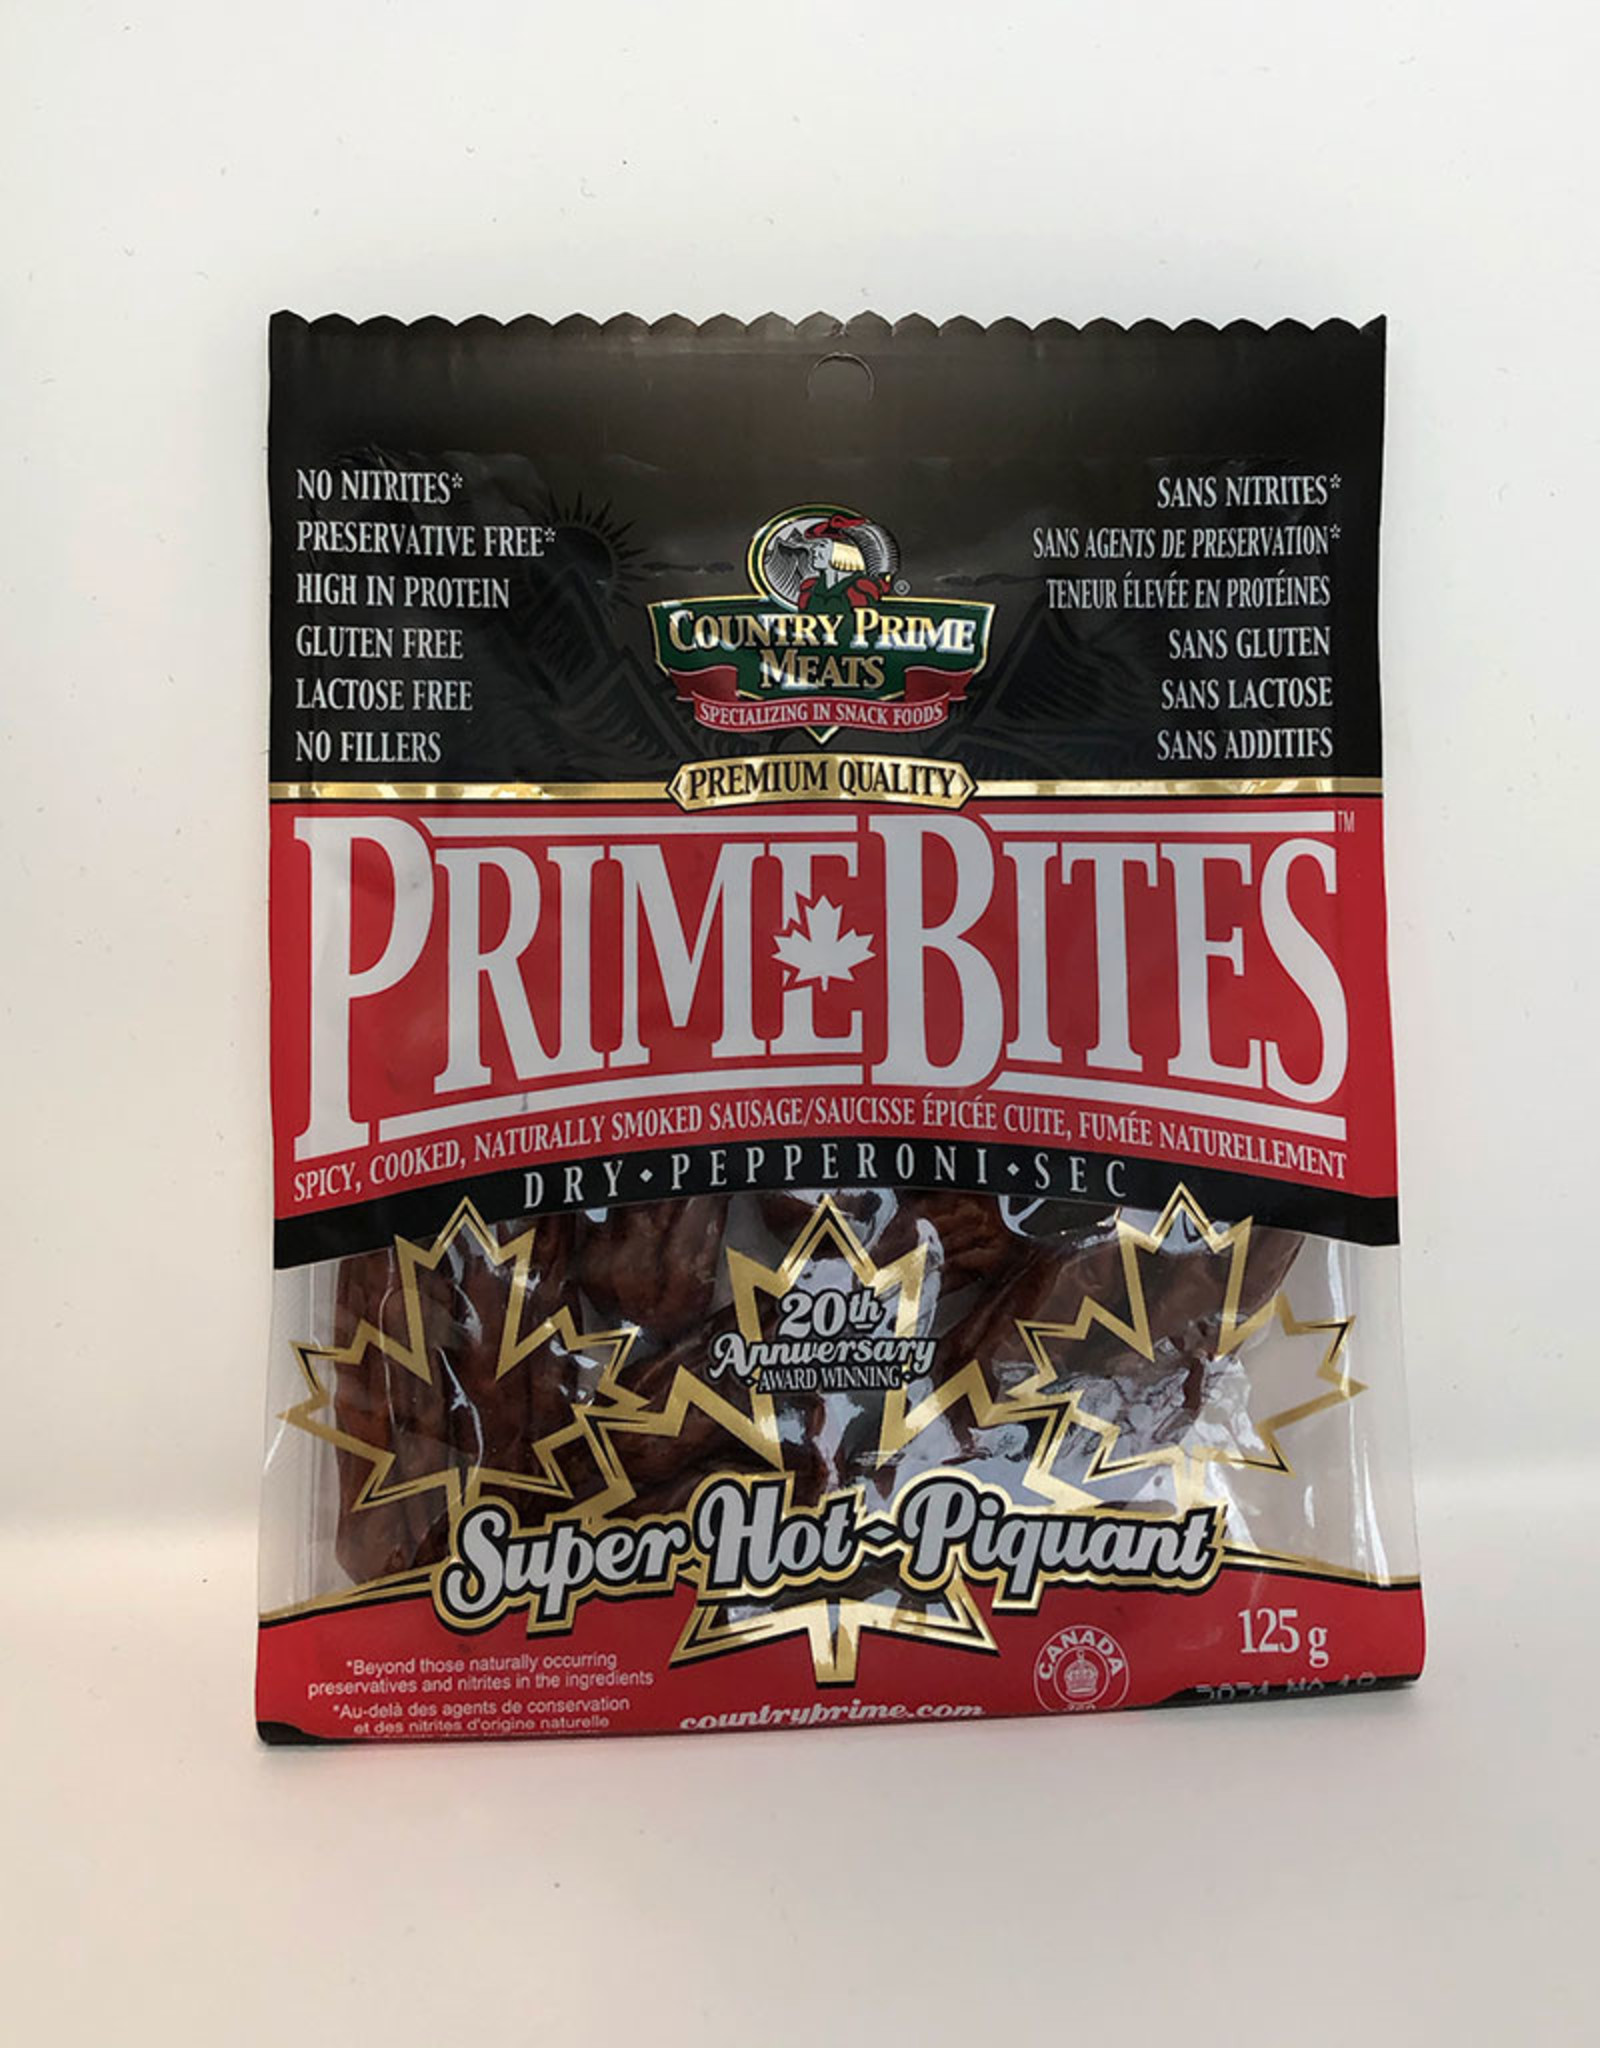 Country Prime Meats Country Prime Meats - Prime Bites, Super Hot (125g)